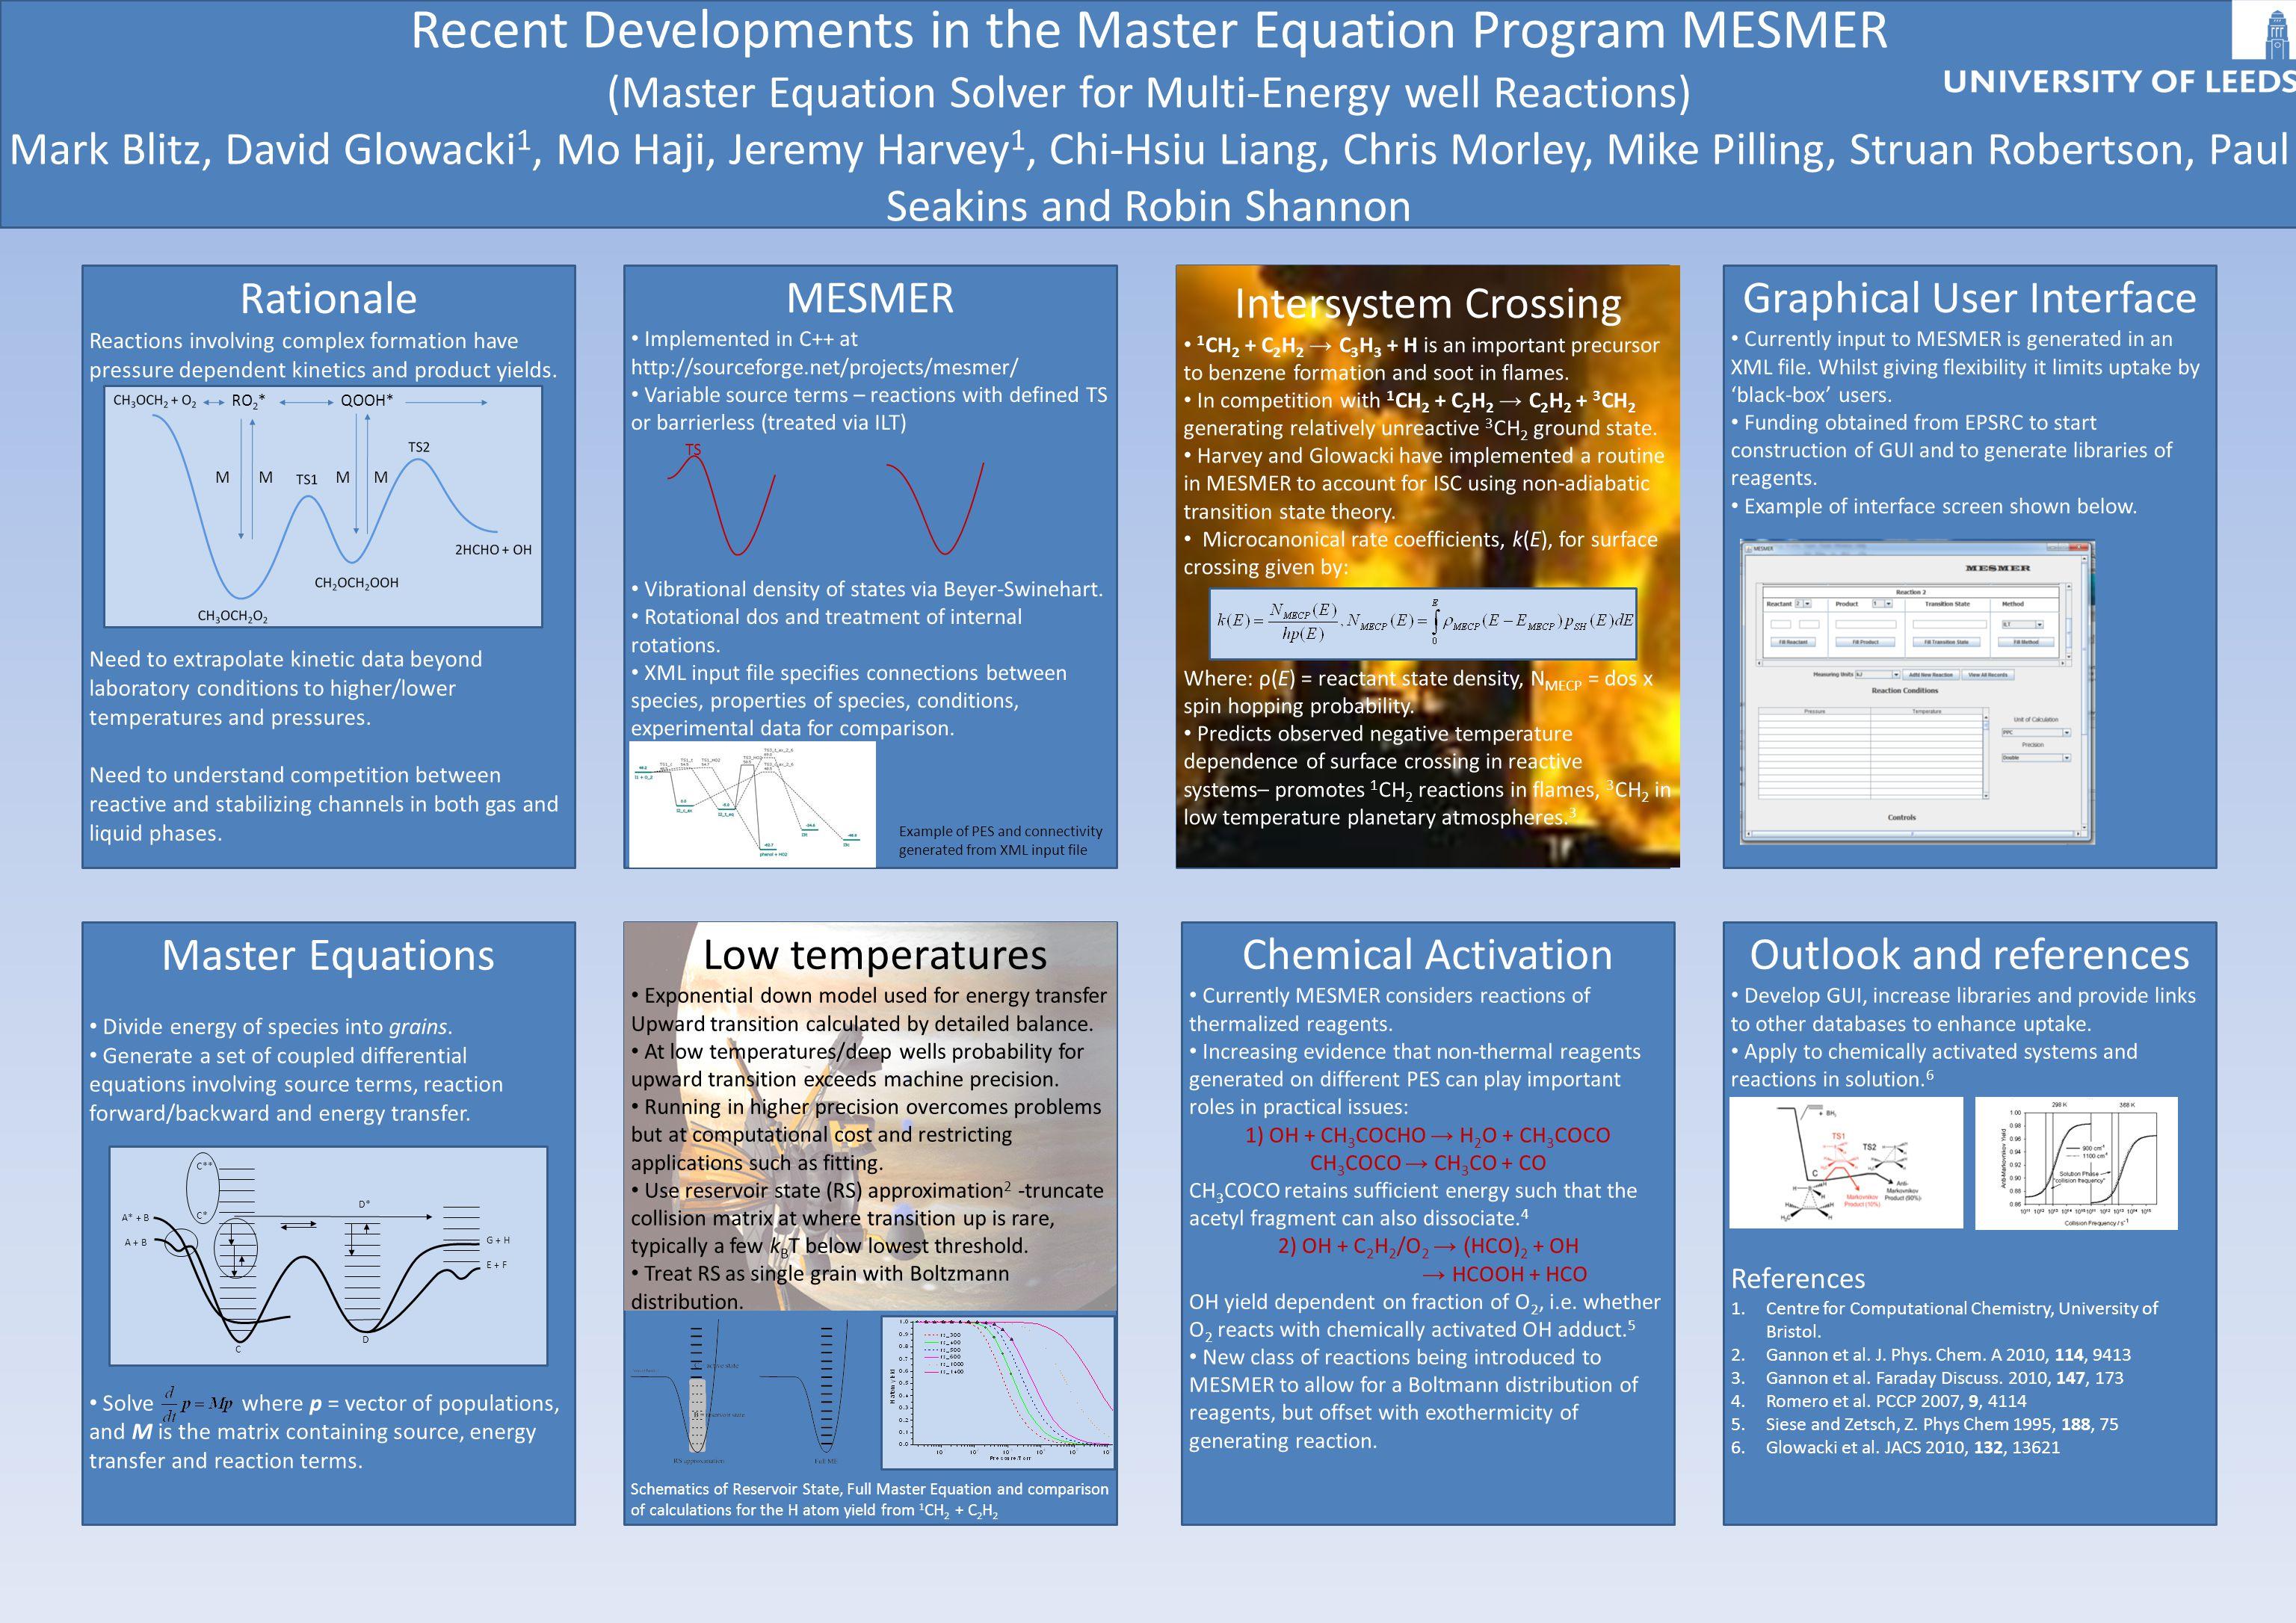 Recent Developments in the Master Equation Program MESMER (Master Equation Solver for Multi-Energy well Reactions) Mark Blitz, David Glowacki 1, Mo Ha